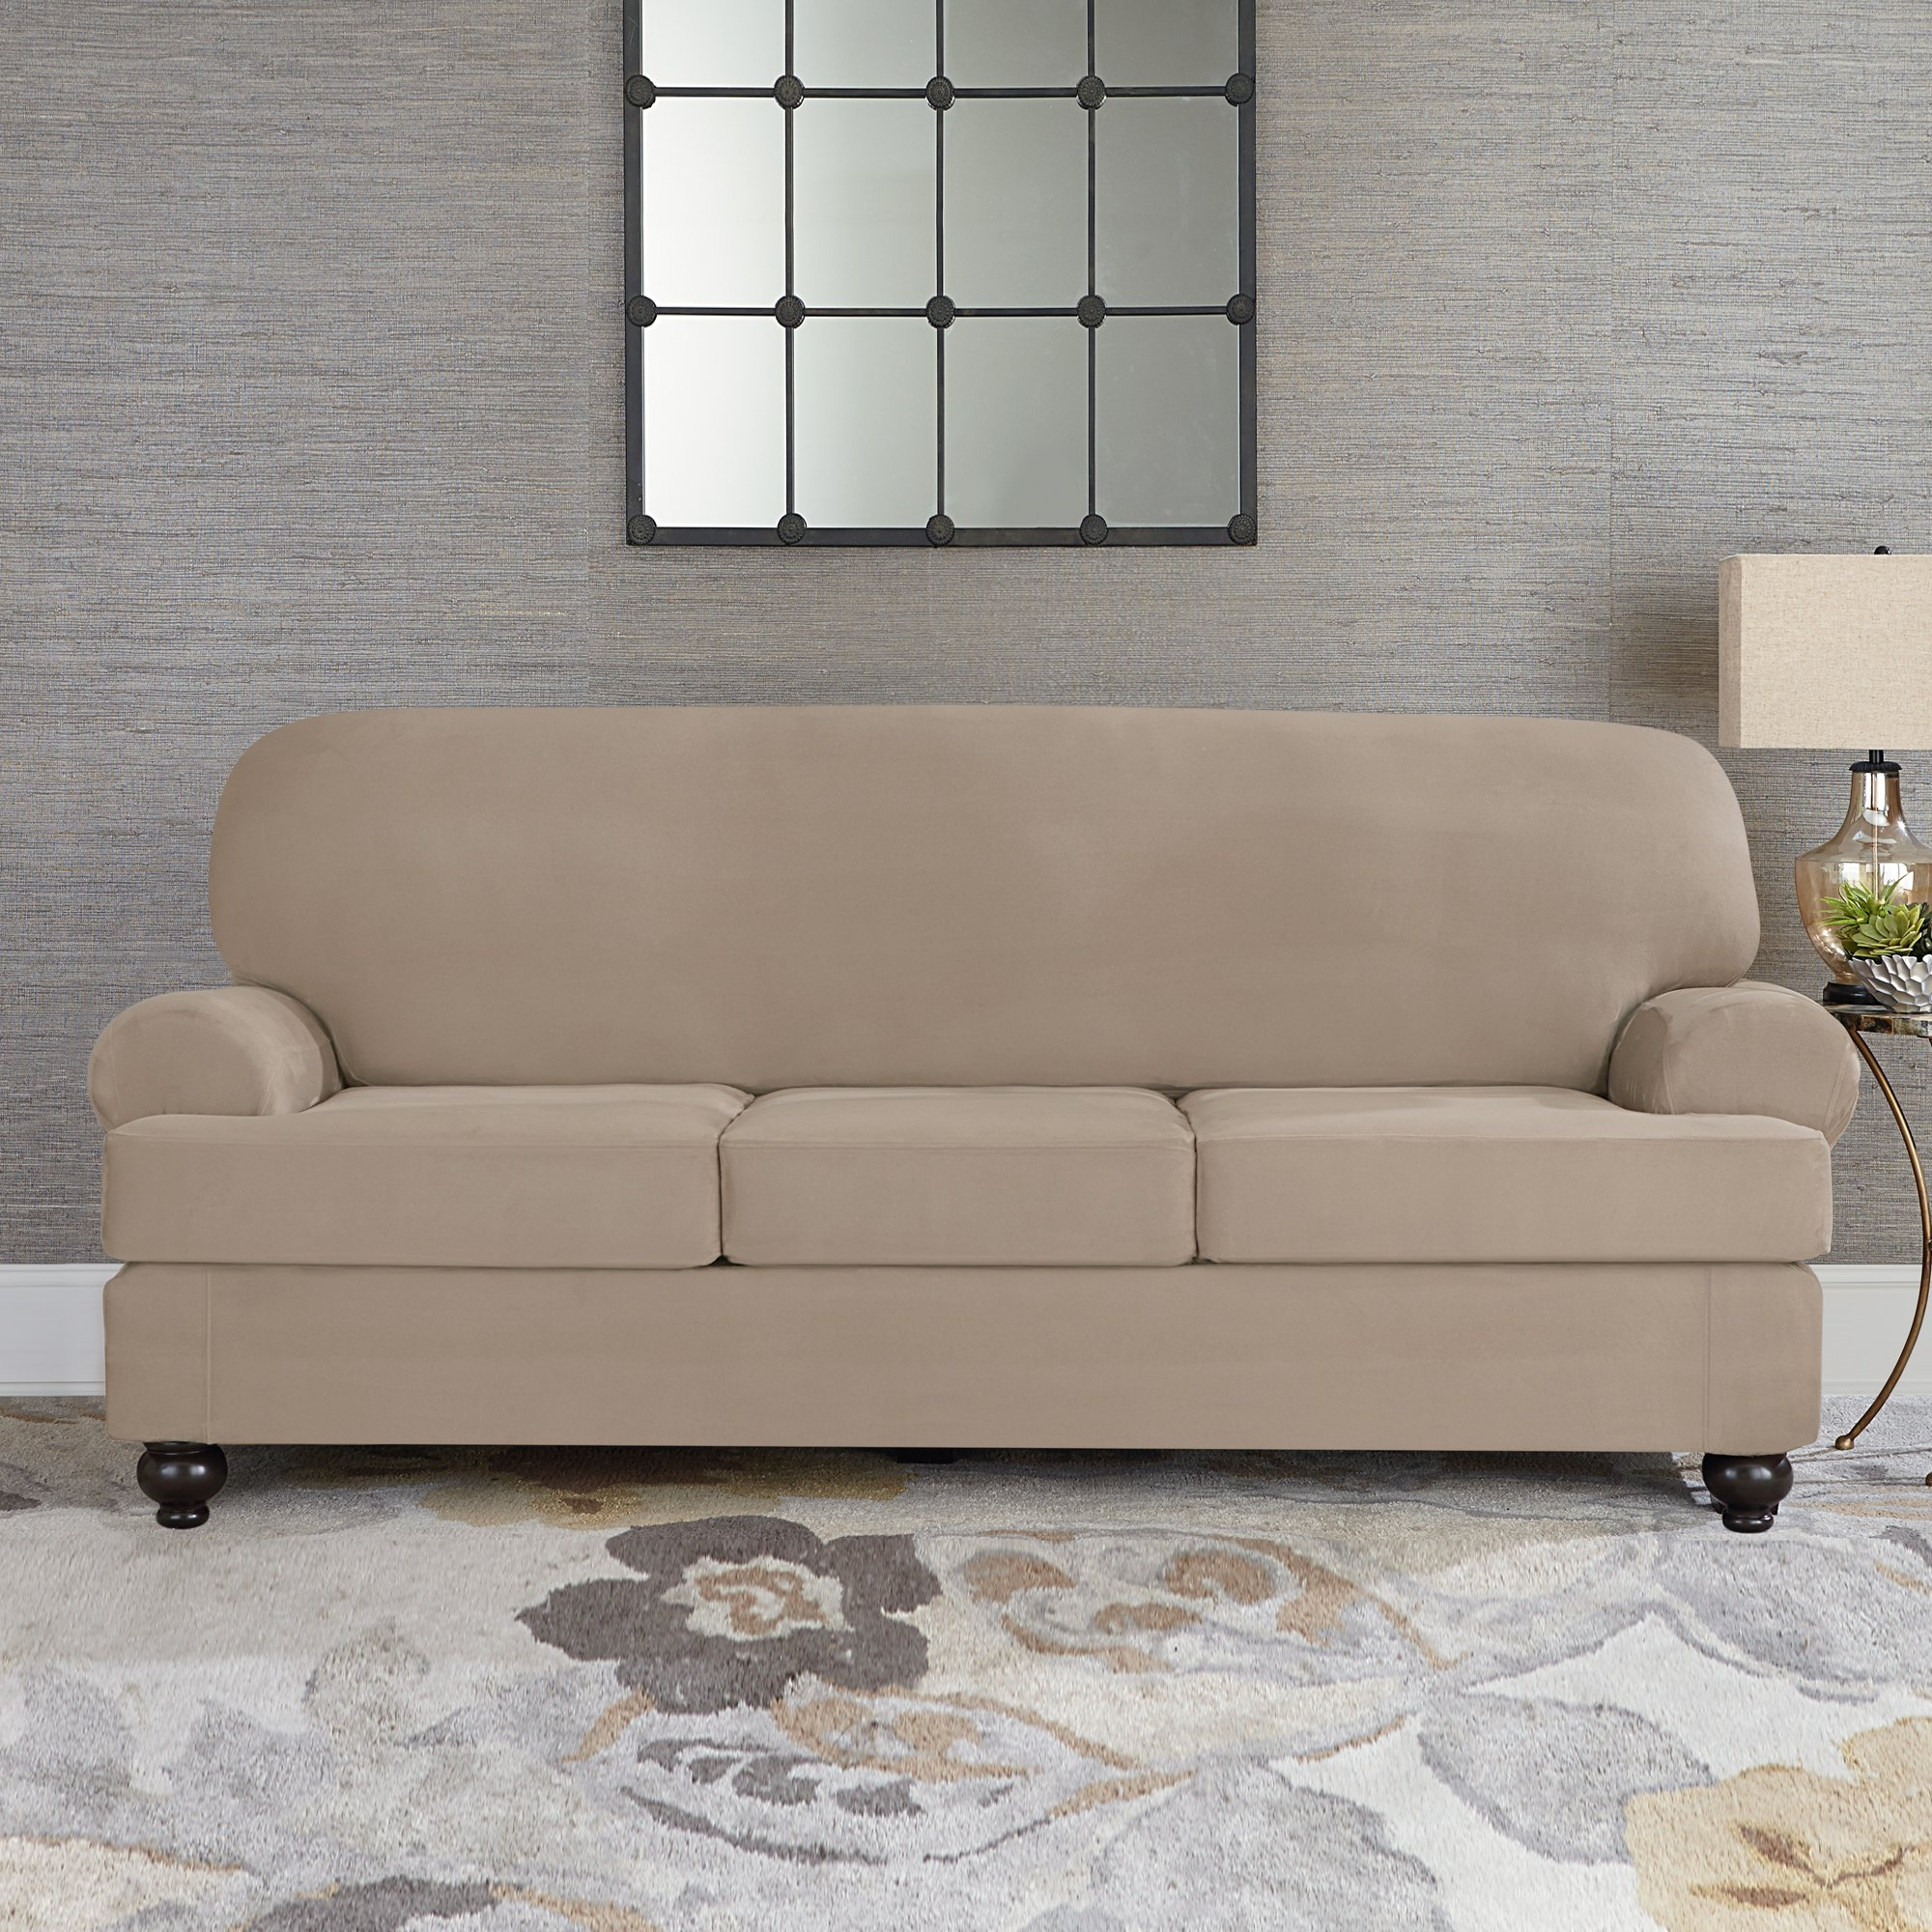 Sure Fit Designer Suede Convertible T-Cushion Sofa 3-Cushion Furniture Cover - Linen (SF44613) by Surefit (Image #2)